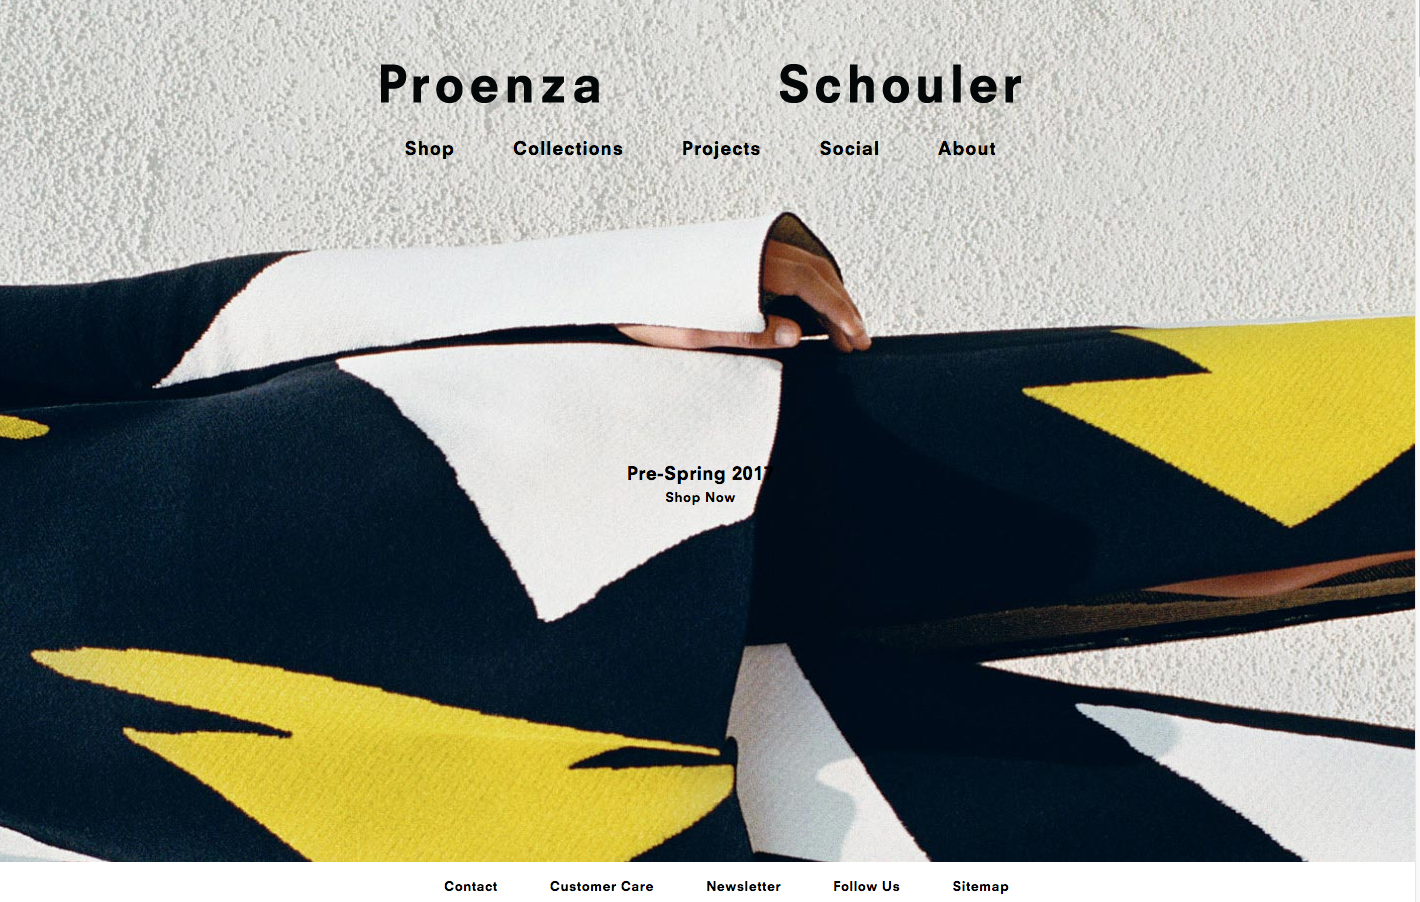 Proenza Schouler Fonts In Use